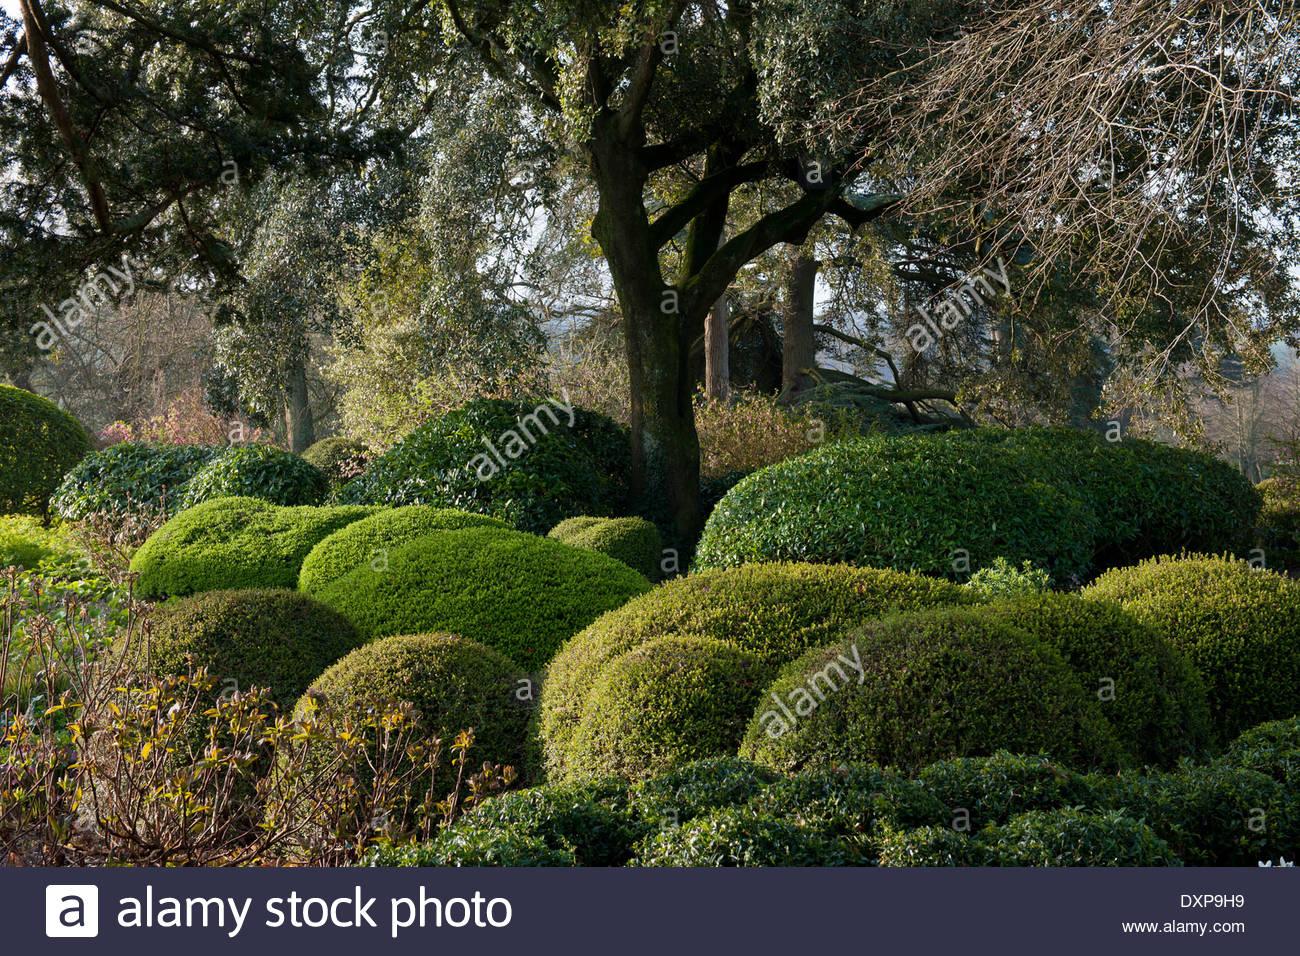 shrubs stockfotos shrubs bilder alamy. Black Bedroom Furniture Sets. Home Design Ideas